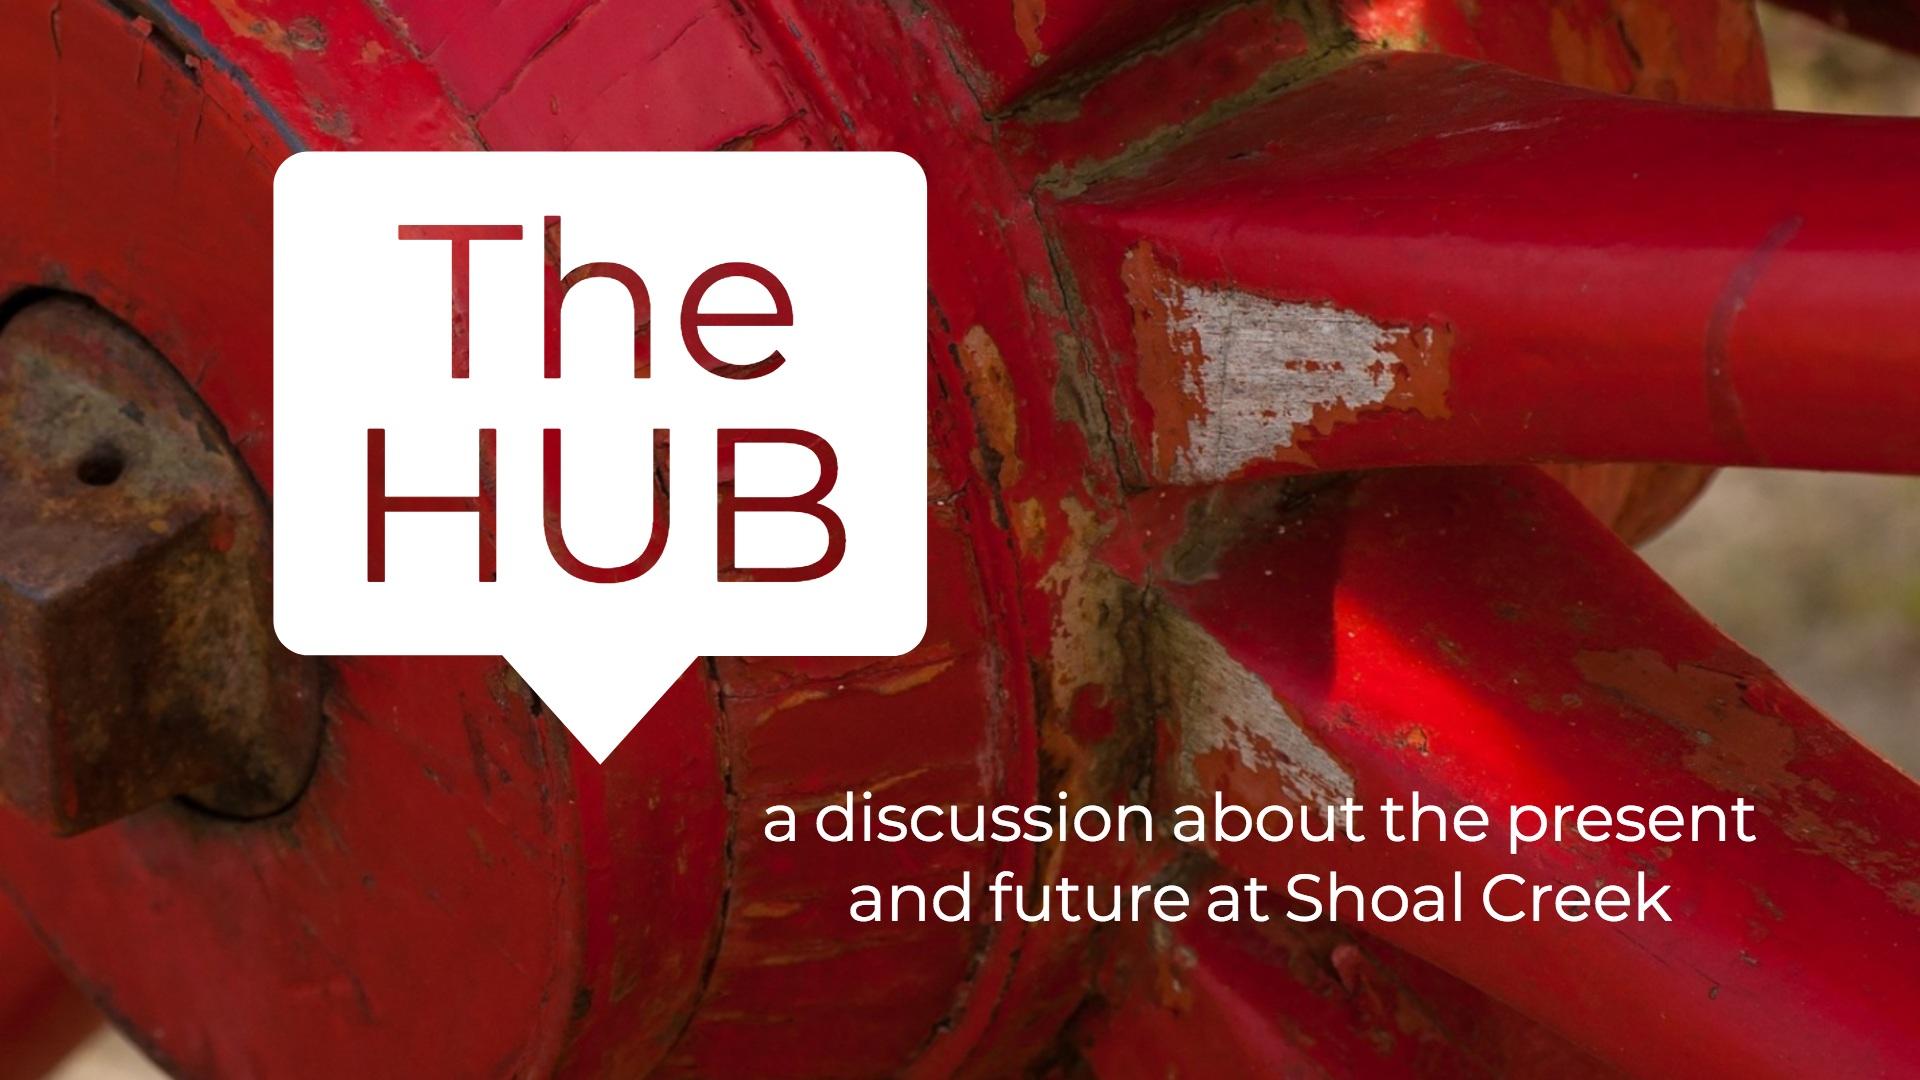 The hub with tagline